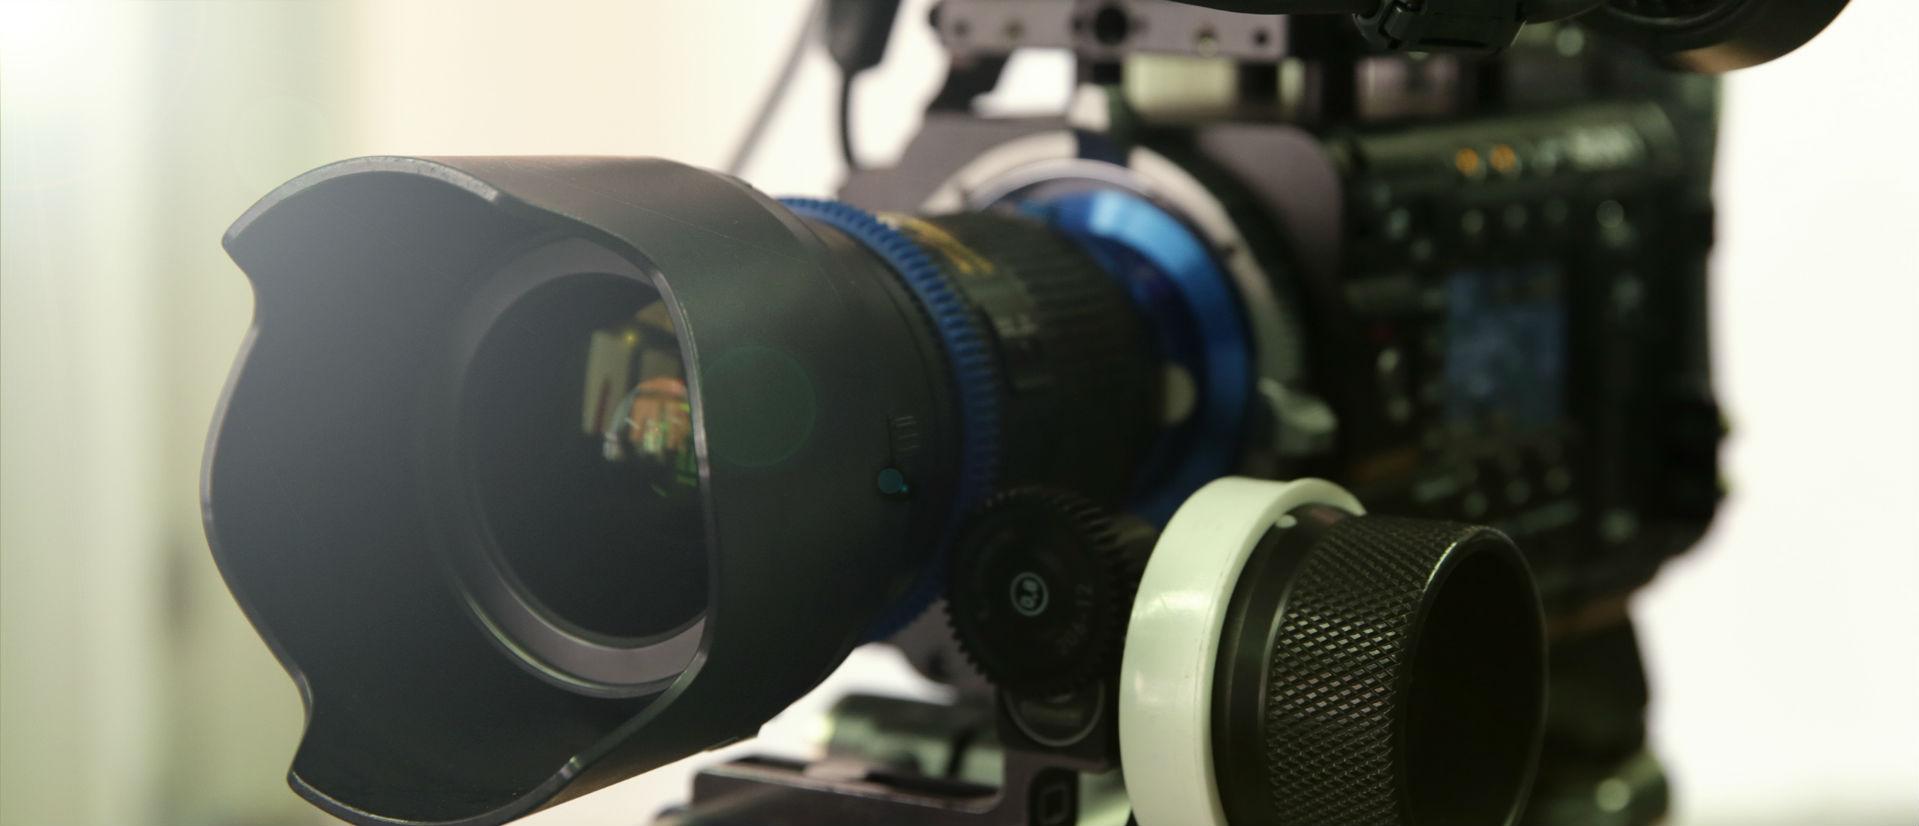 20150624_kameratechnik